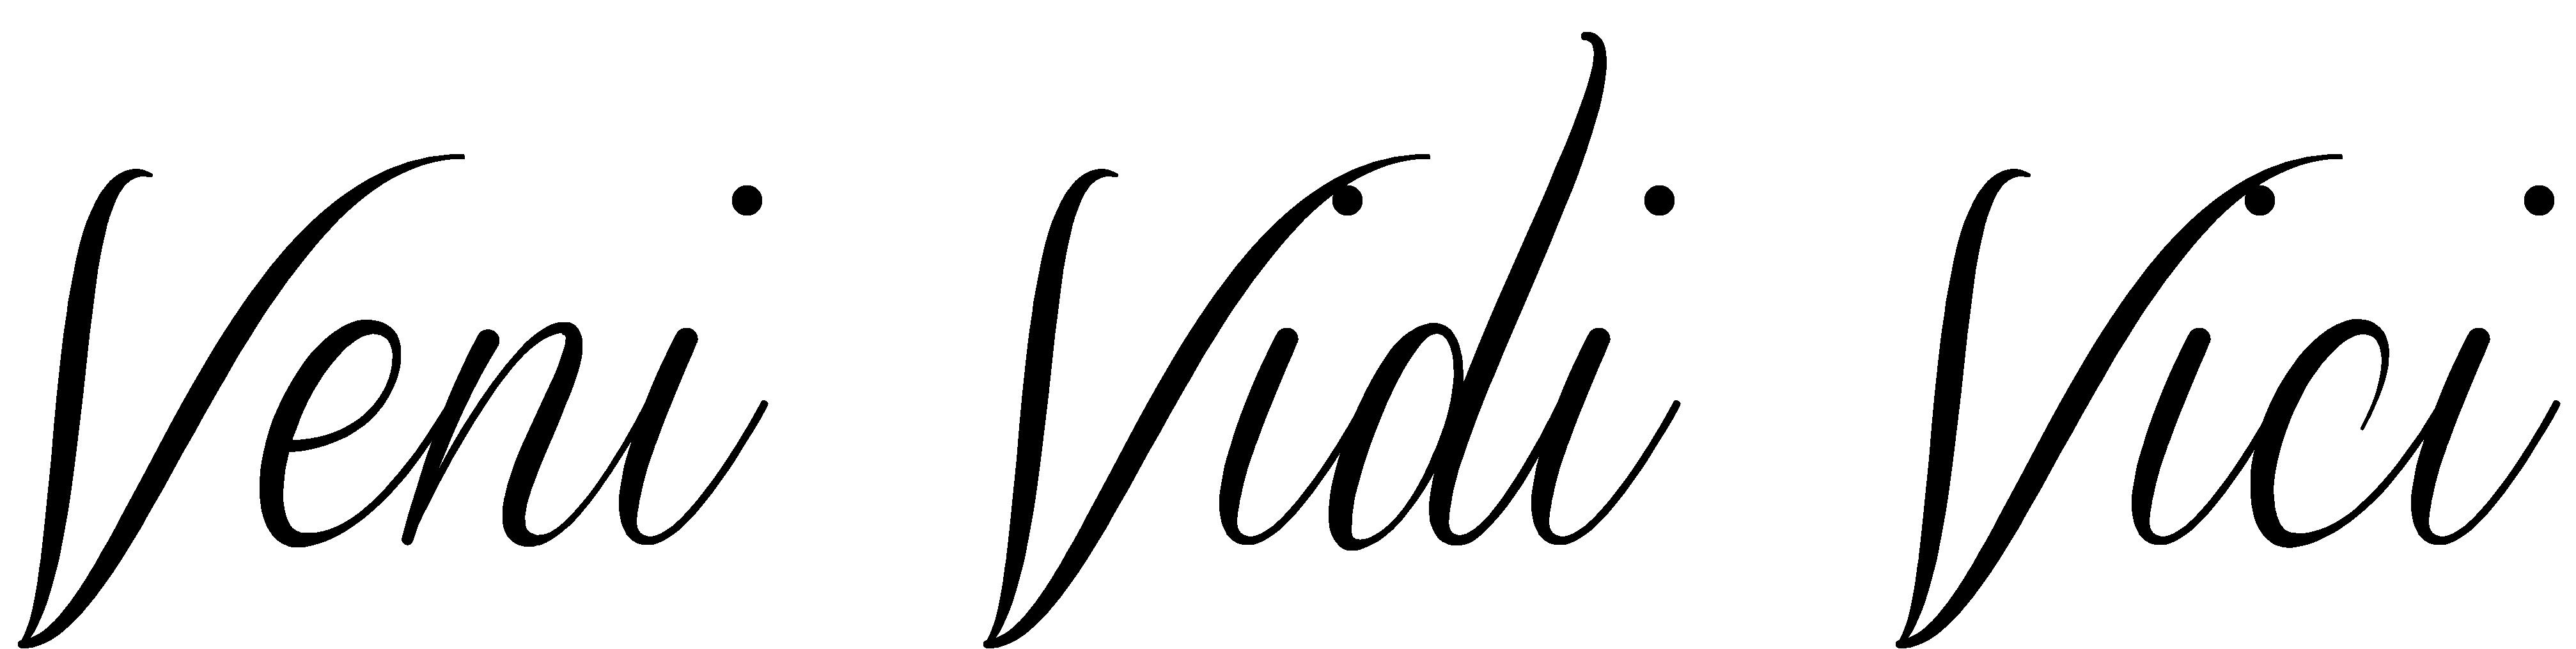 Californeyea